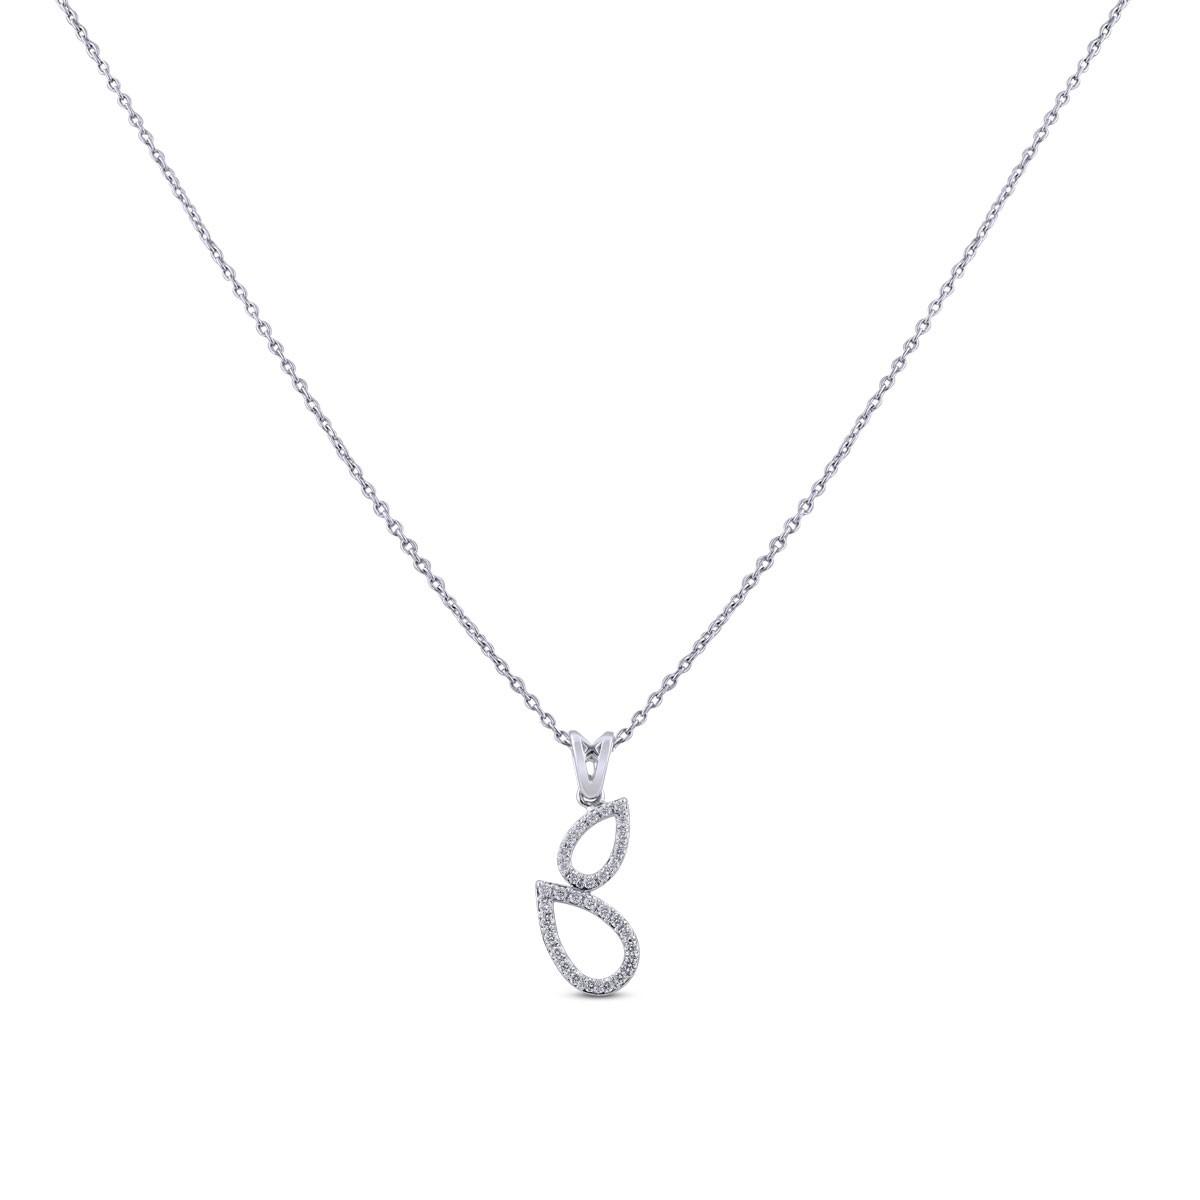 Mago White Gold Diamond Pendant with Chain